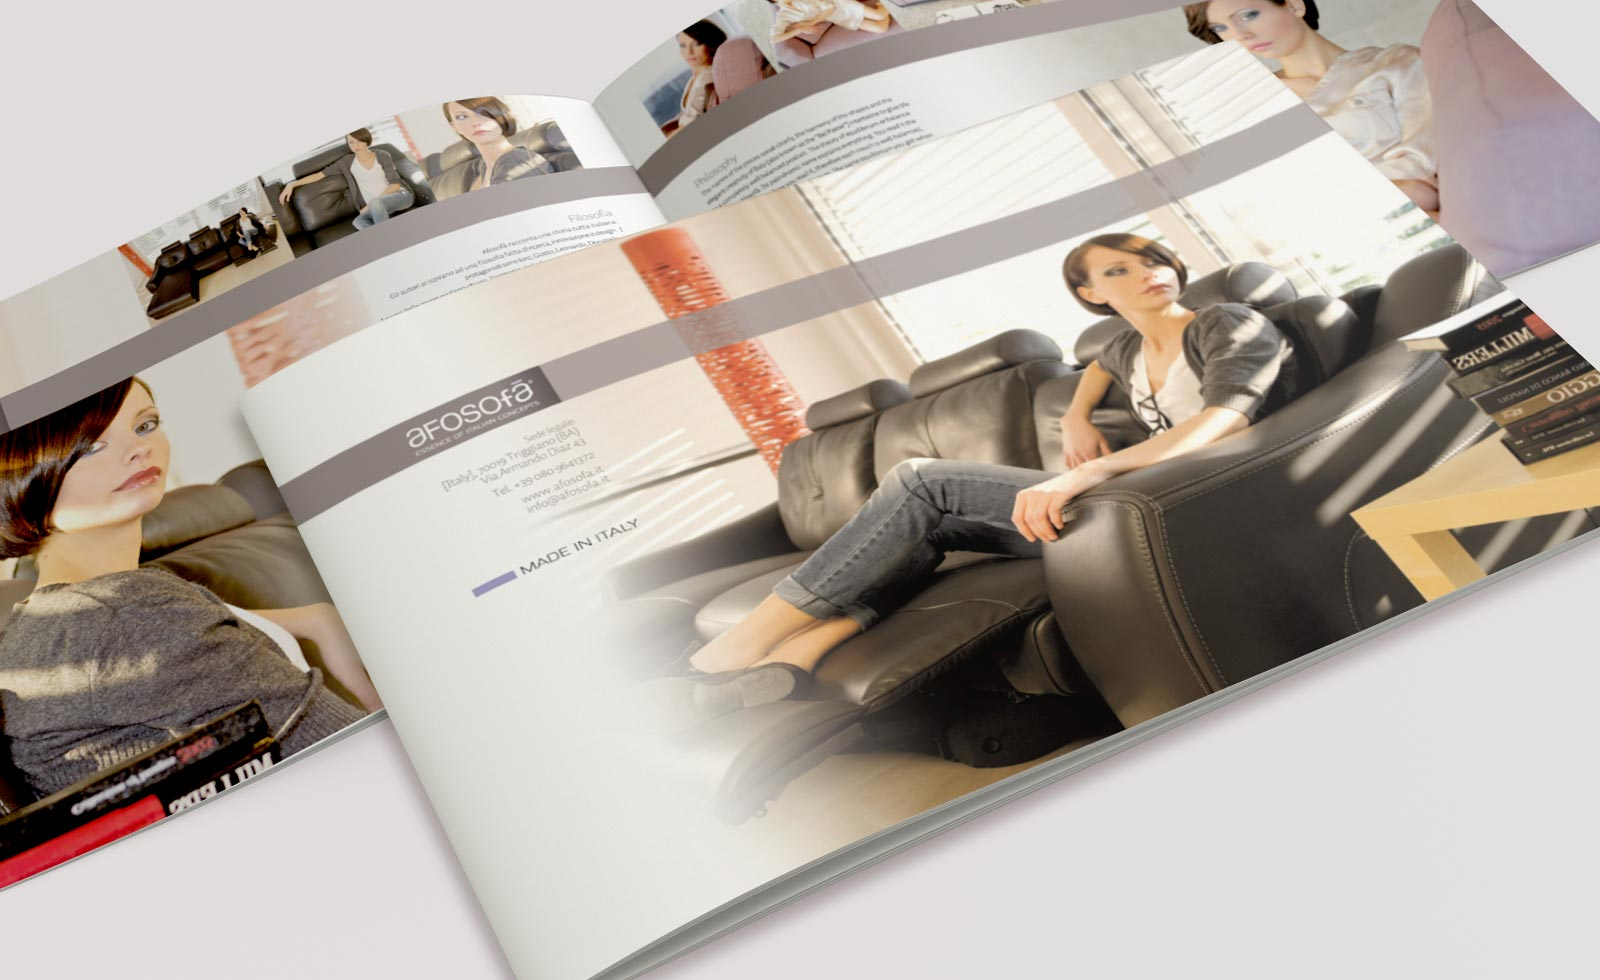 sofa divani arredamento pitscheider maggipinto